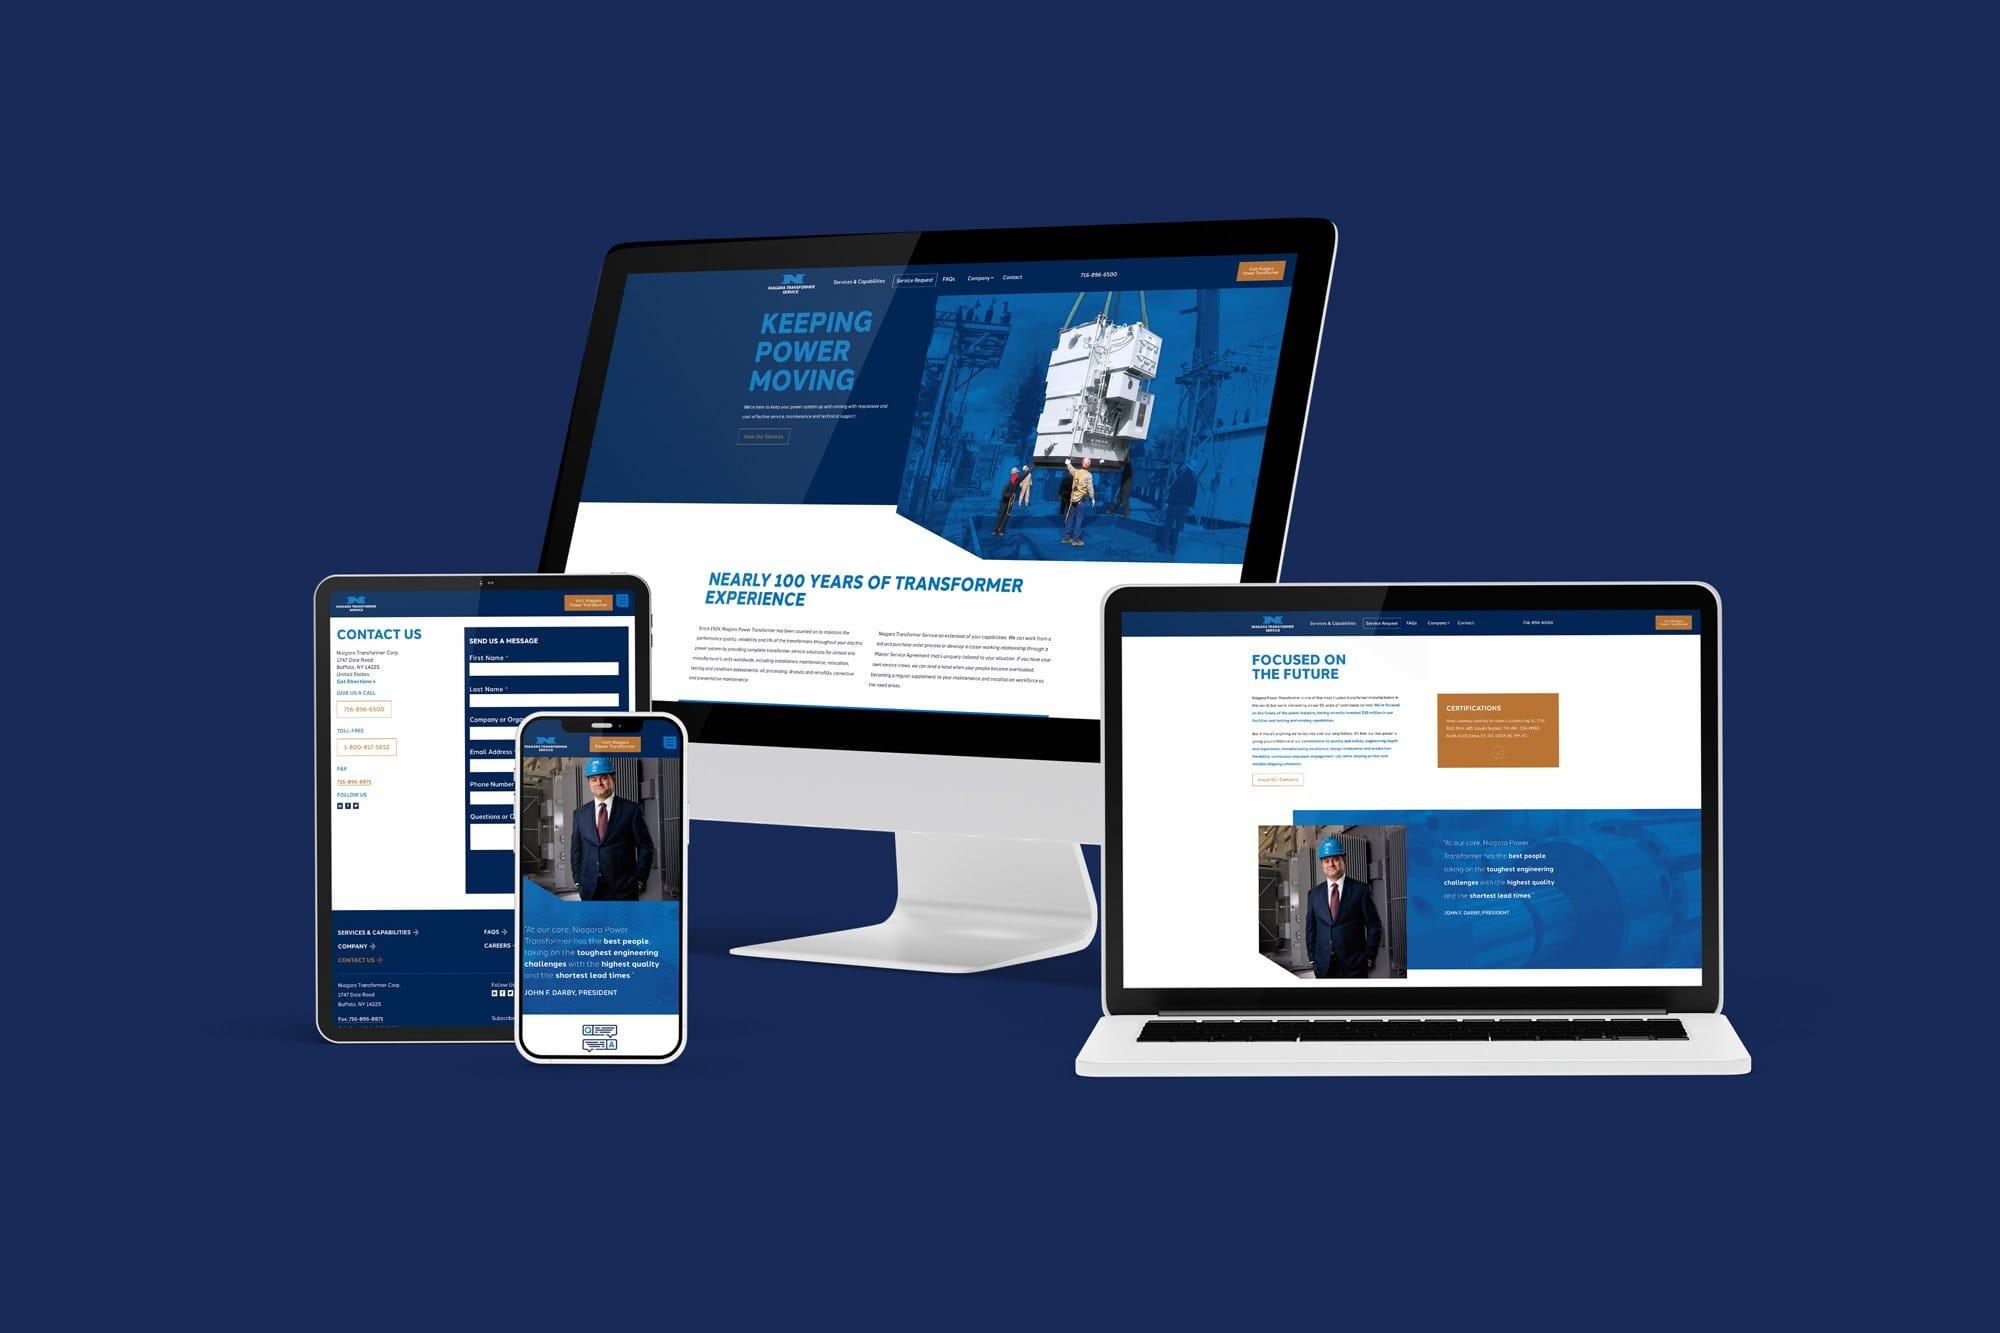 Niagara Transformer Service Website Design